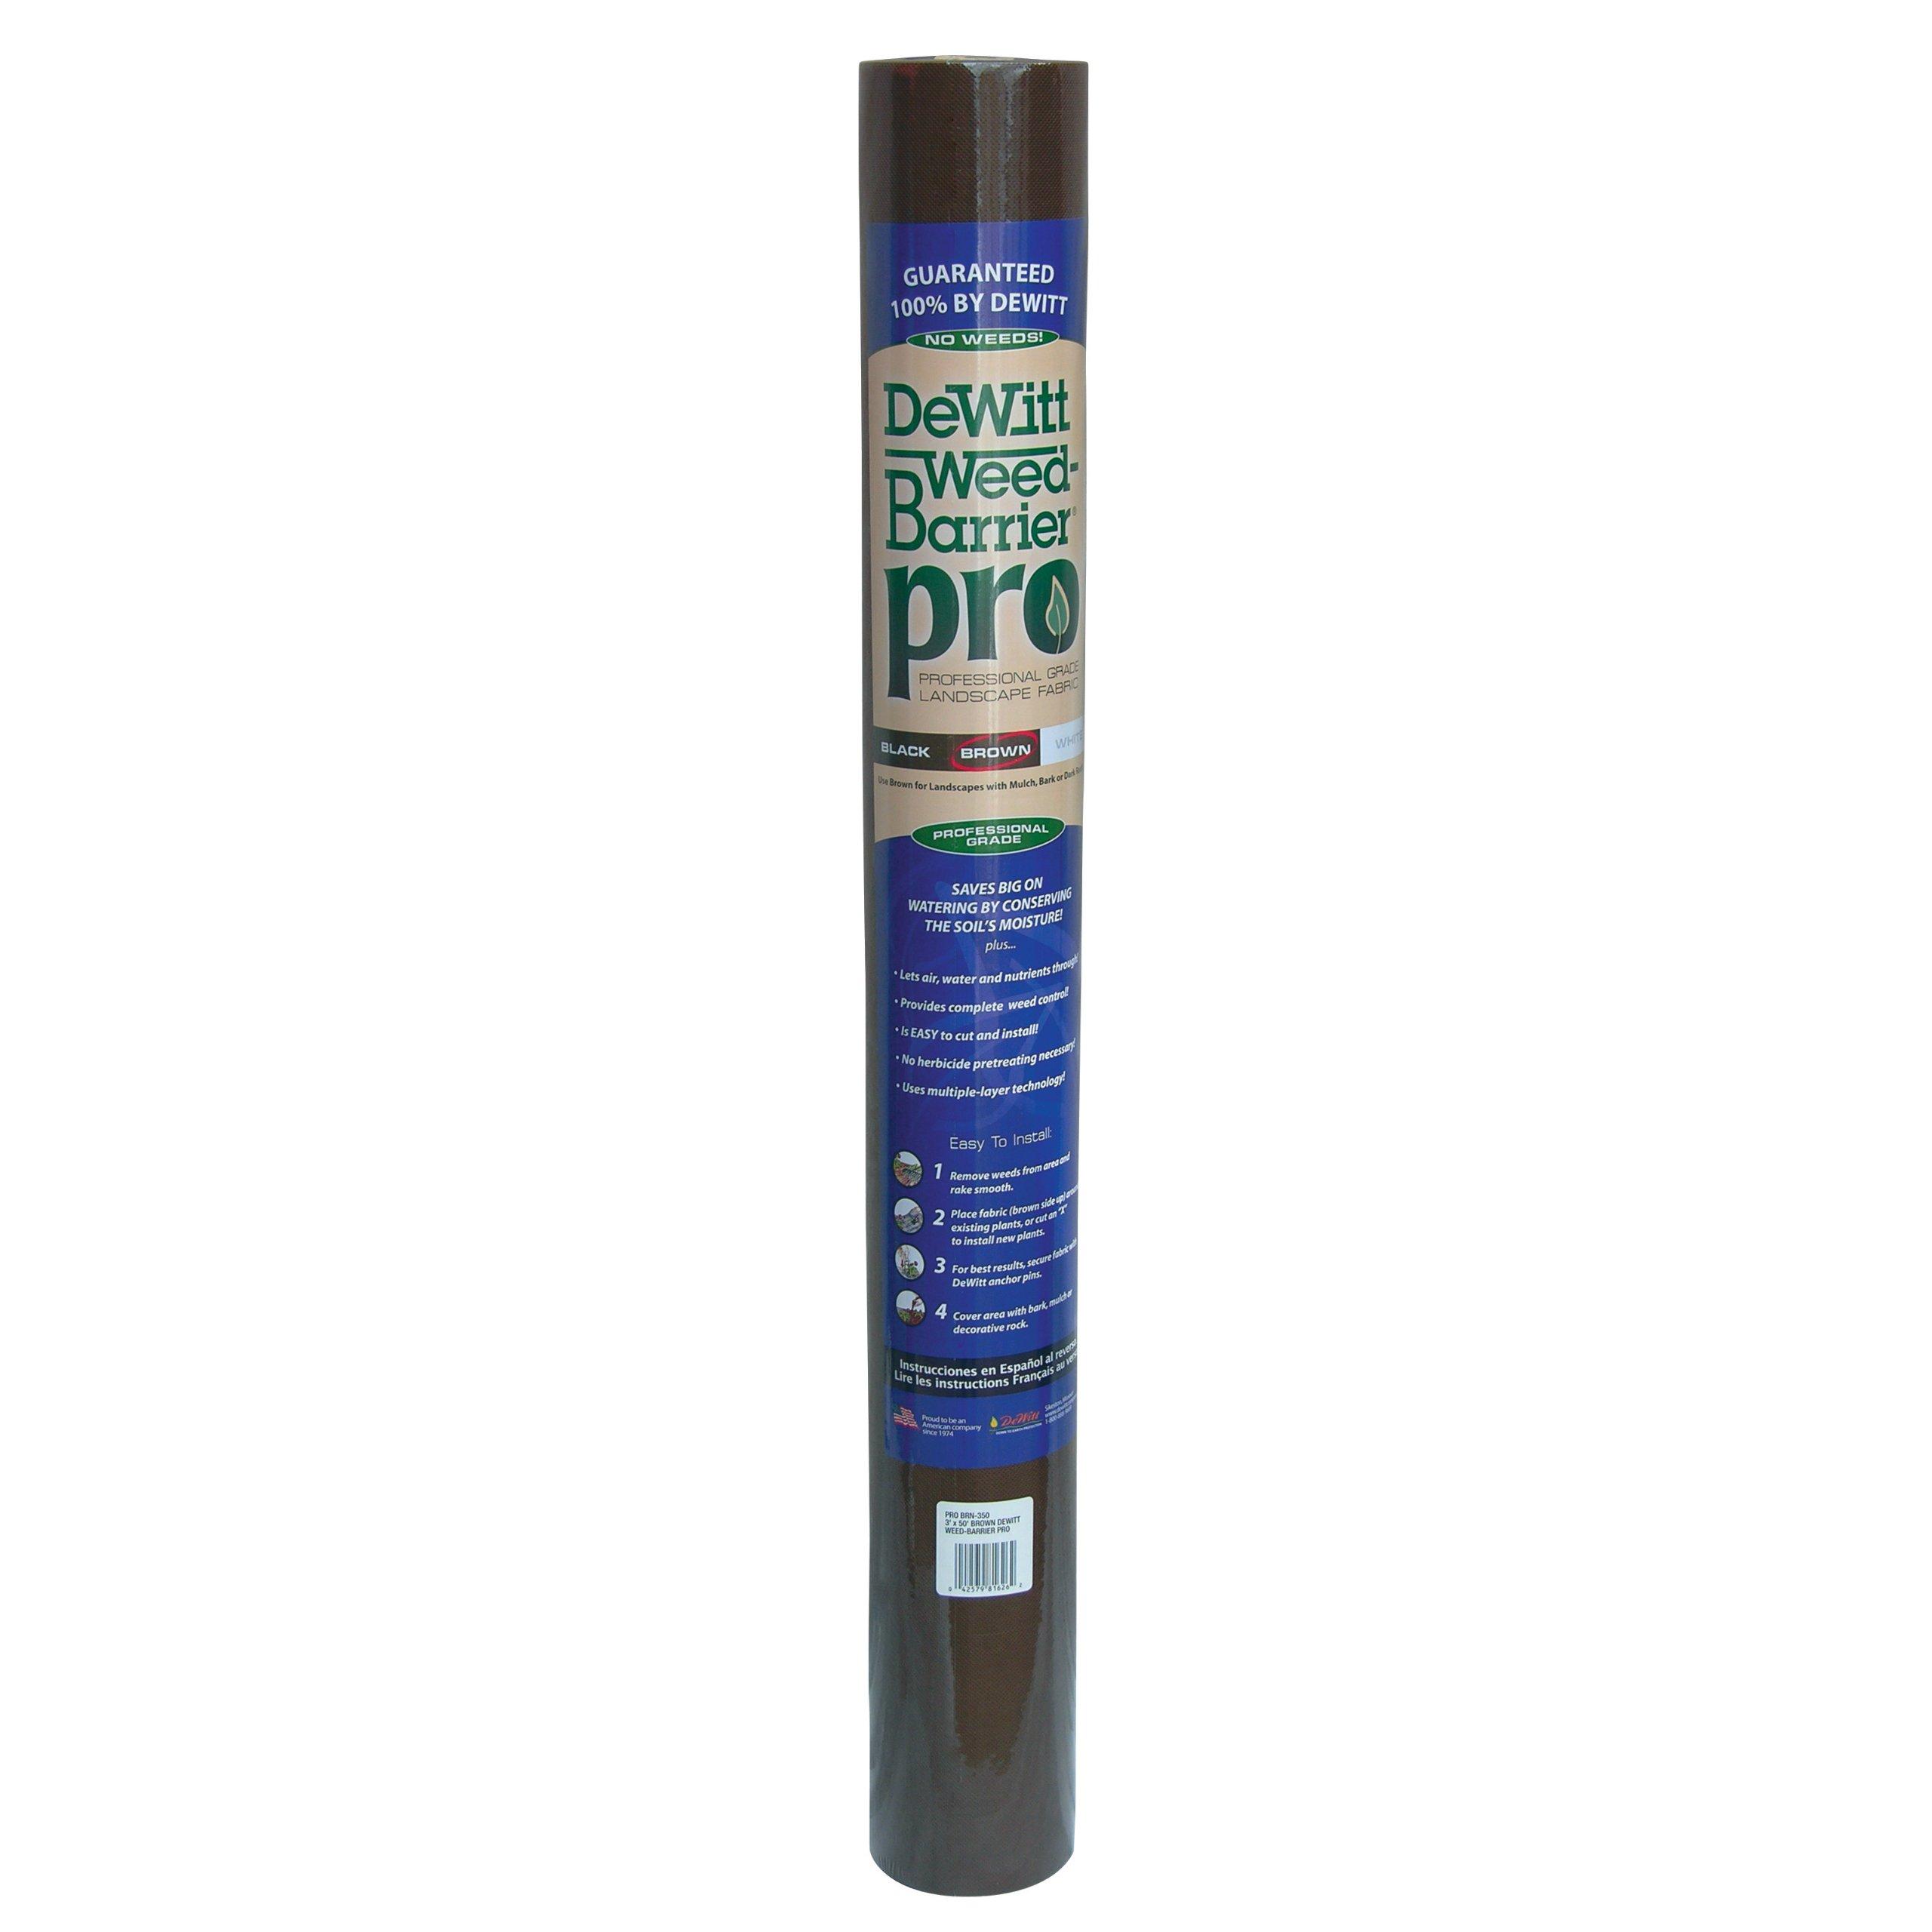 DeWitt PS BRN-4300 Weed Barrier Pro, Brown